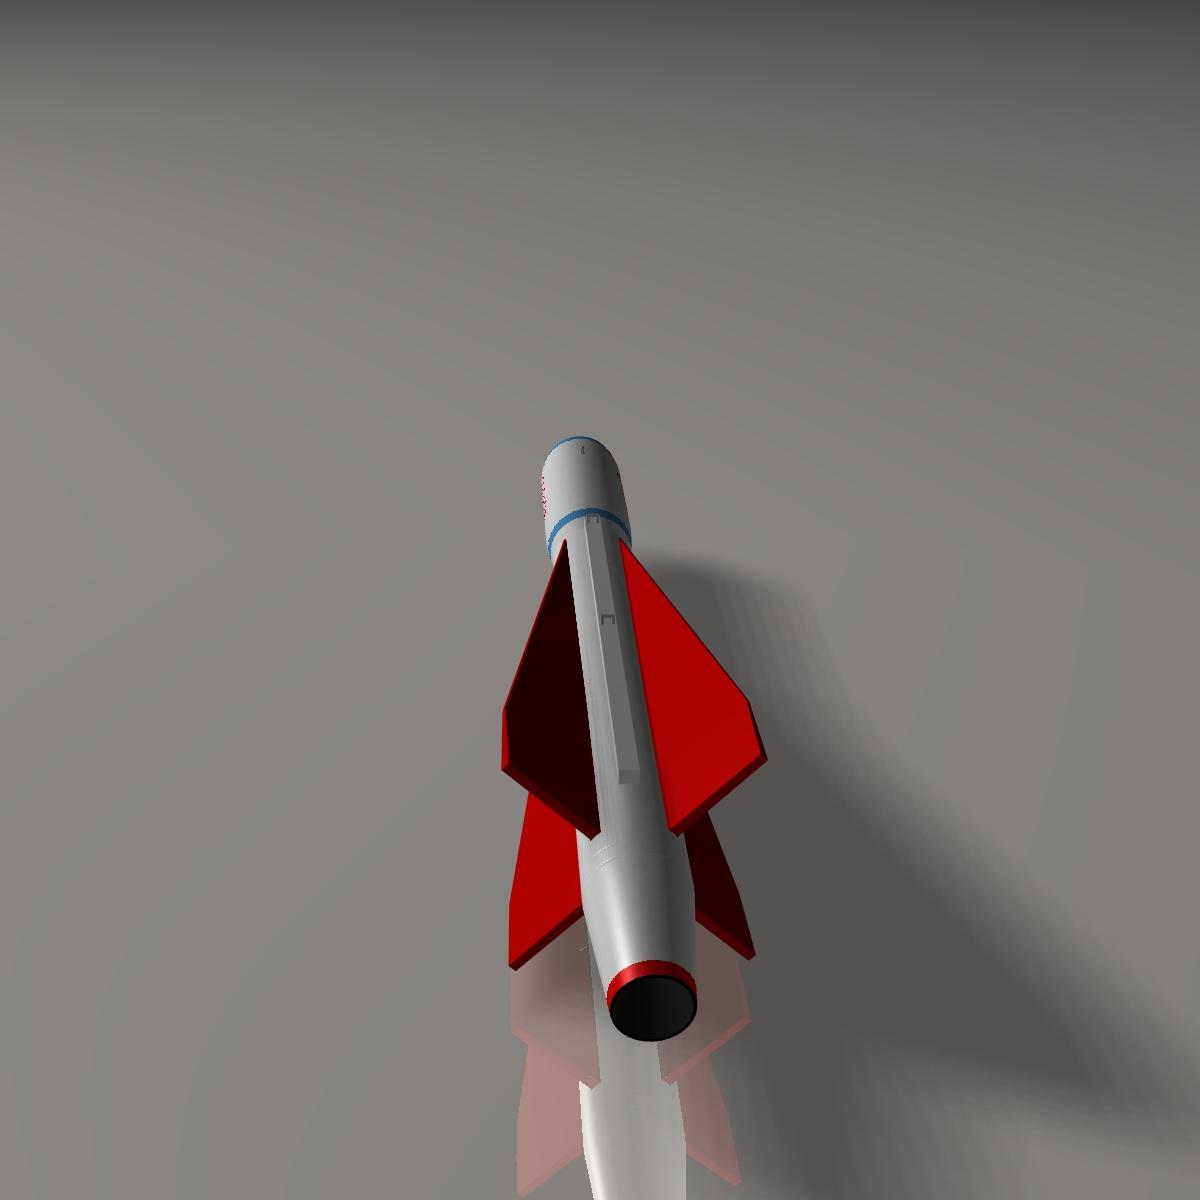 iran yasser asm raketi 3d modeli 3ds dxf cob x obj 150572